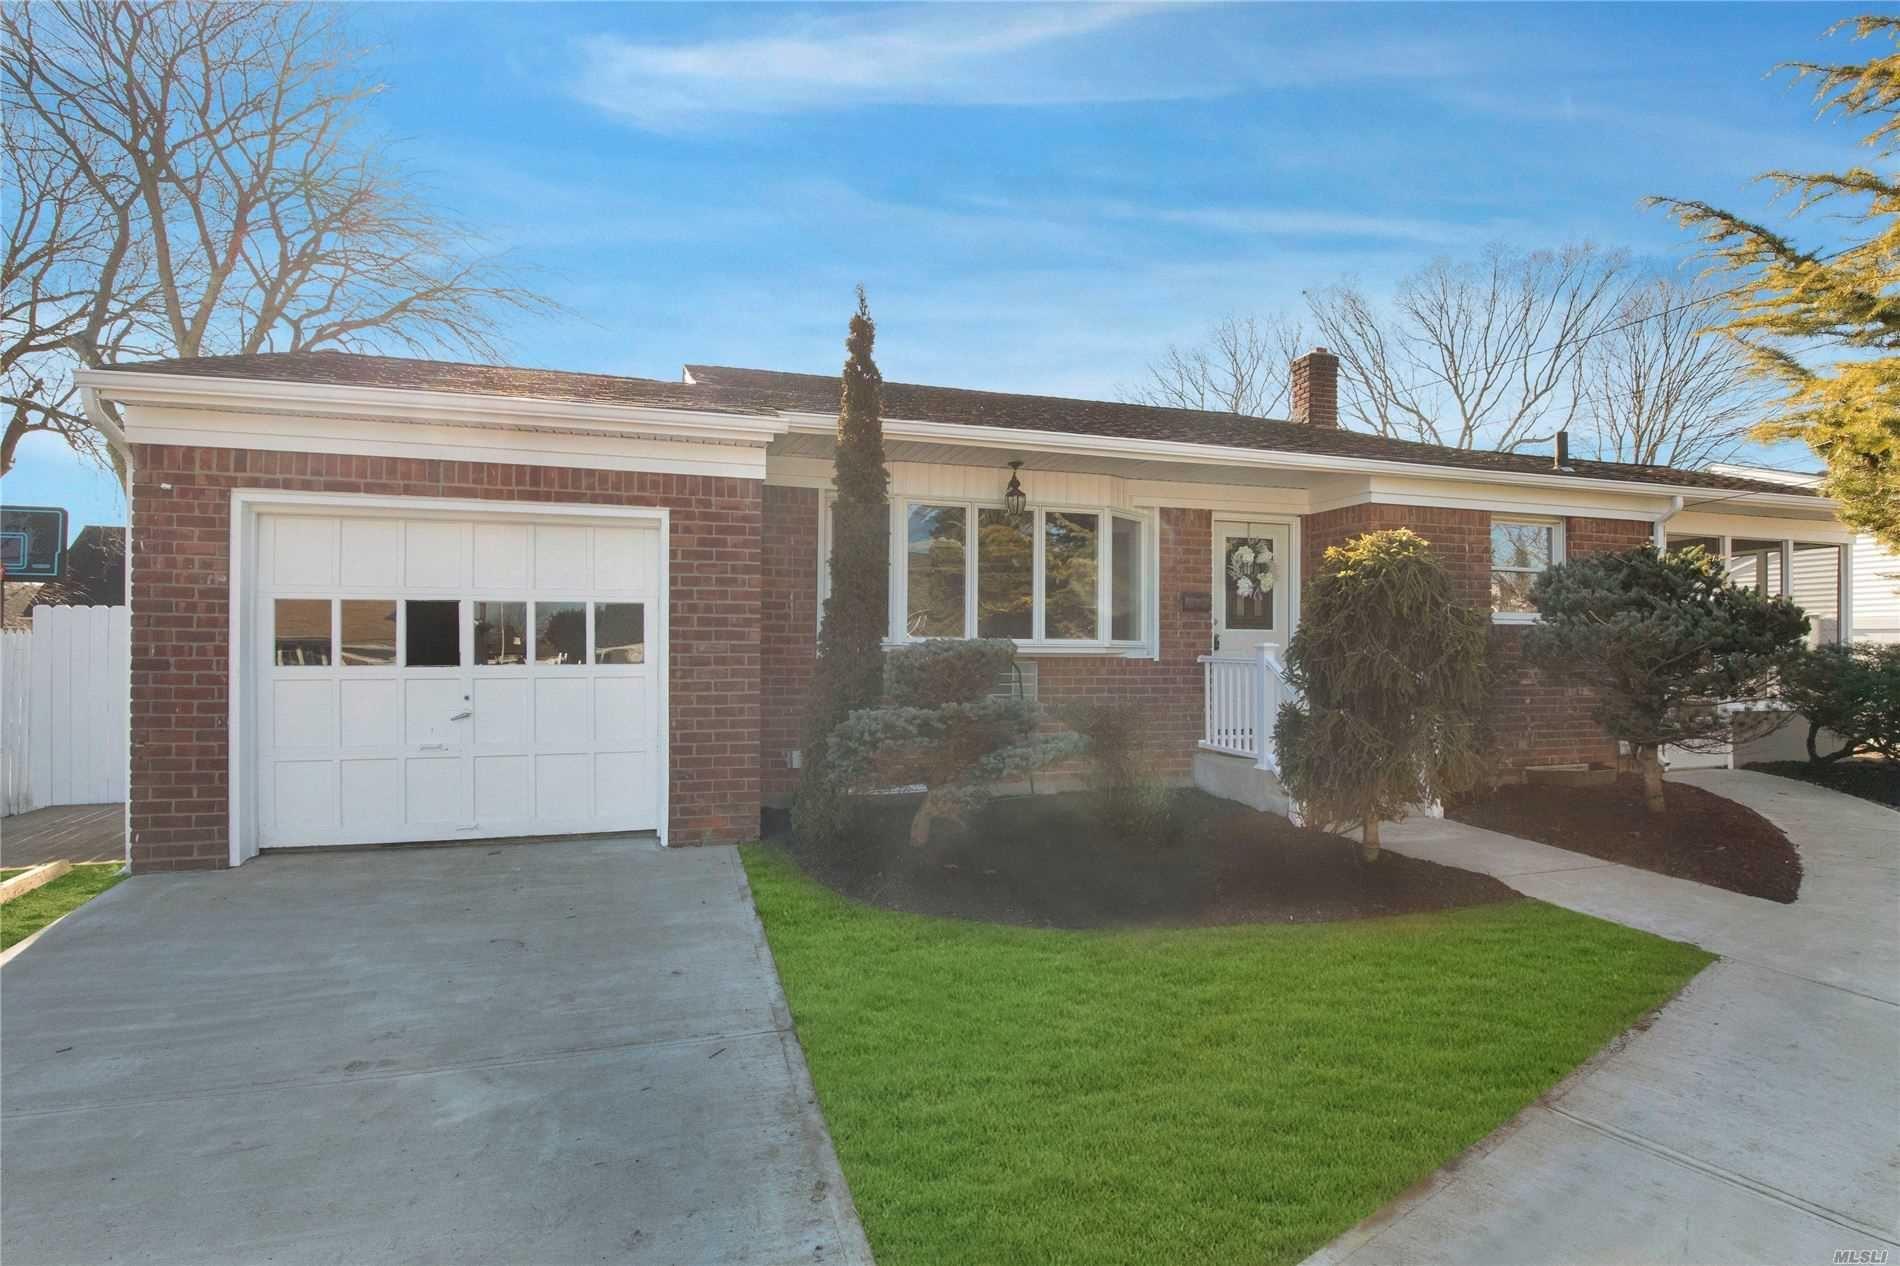 208 Plitt Avenue, Farmingdale, NY 11735 - MLS#: 3195744